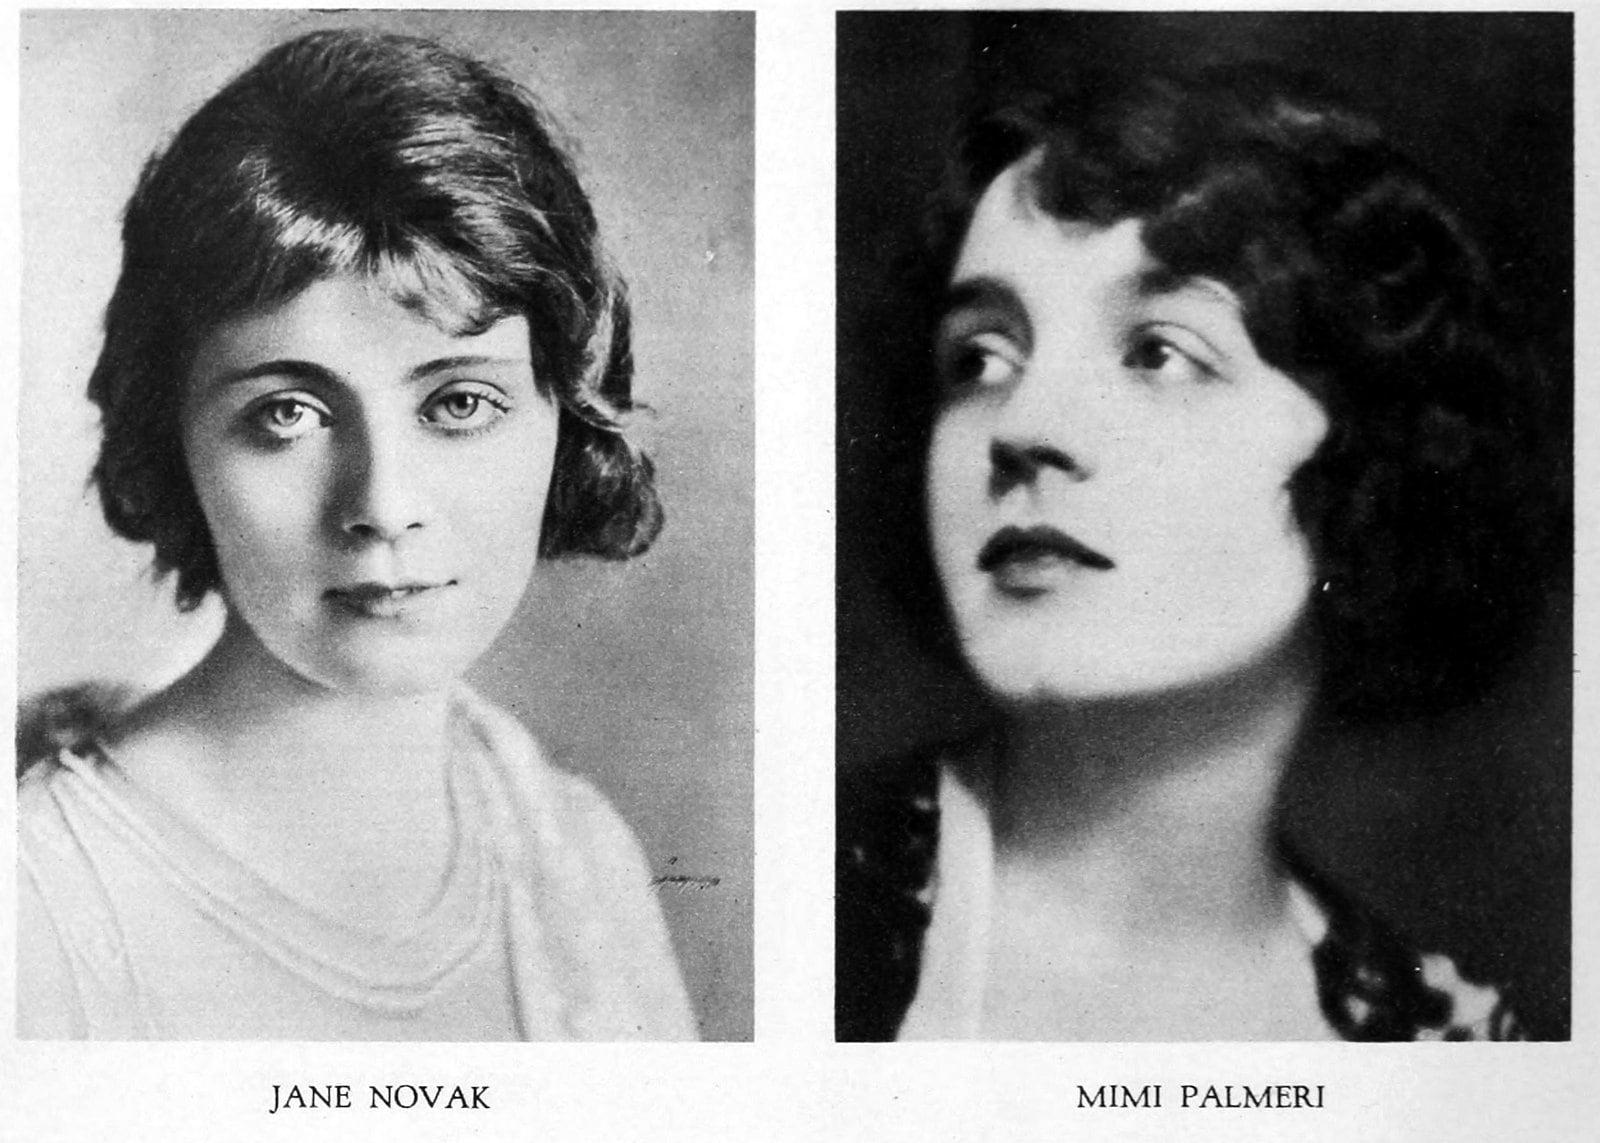 Vintage 1920s hairstyles - Jane Novak and Mimi Palmeri